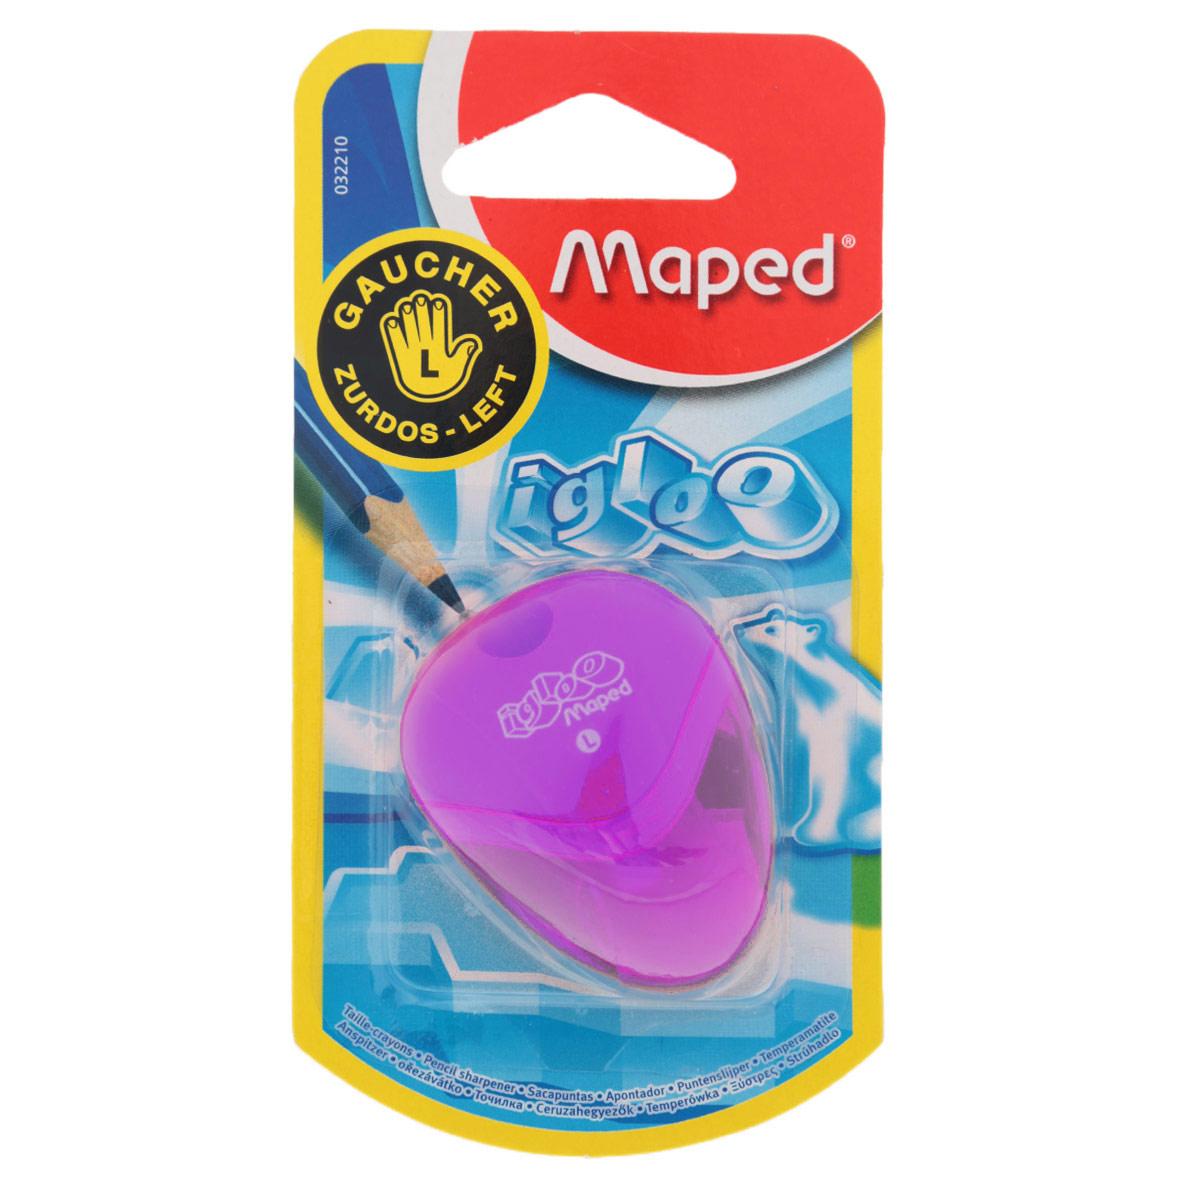 Точилка Maped Igloo, для левшей, цвет: фиолетовый перфоратор aeg kh 24 ie